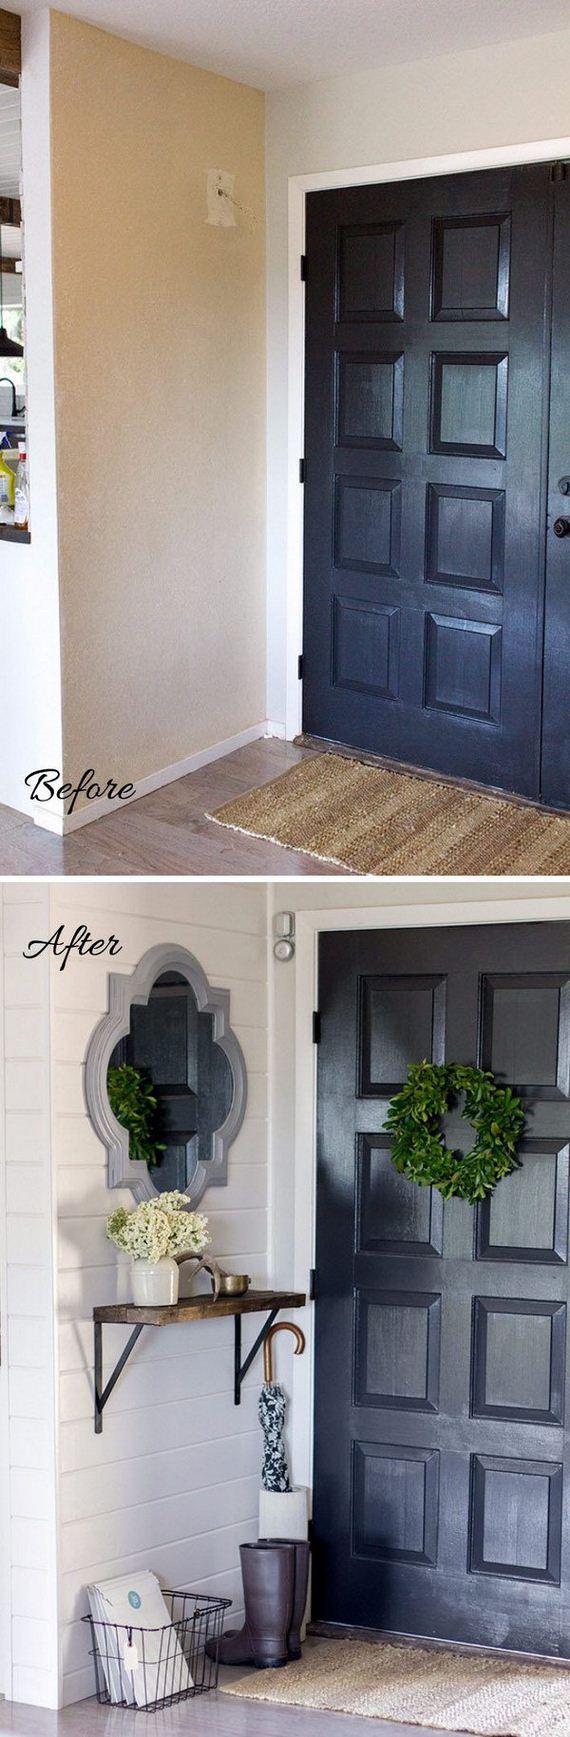 11-amazing-entryway-makeover